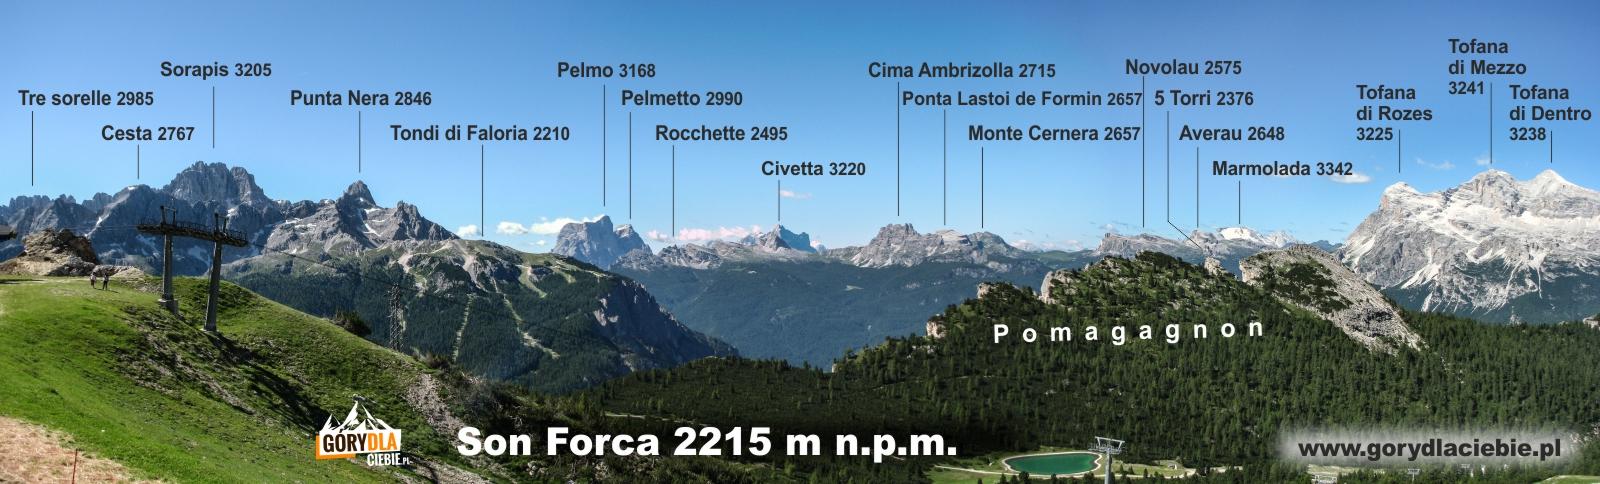 Panorama zopisem zSon Forca 2215 m